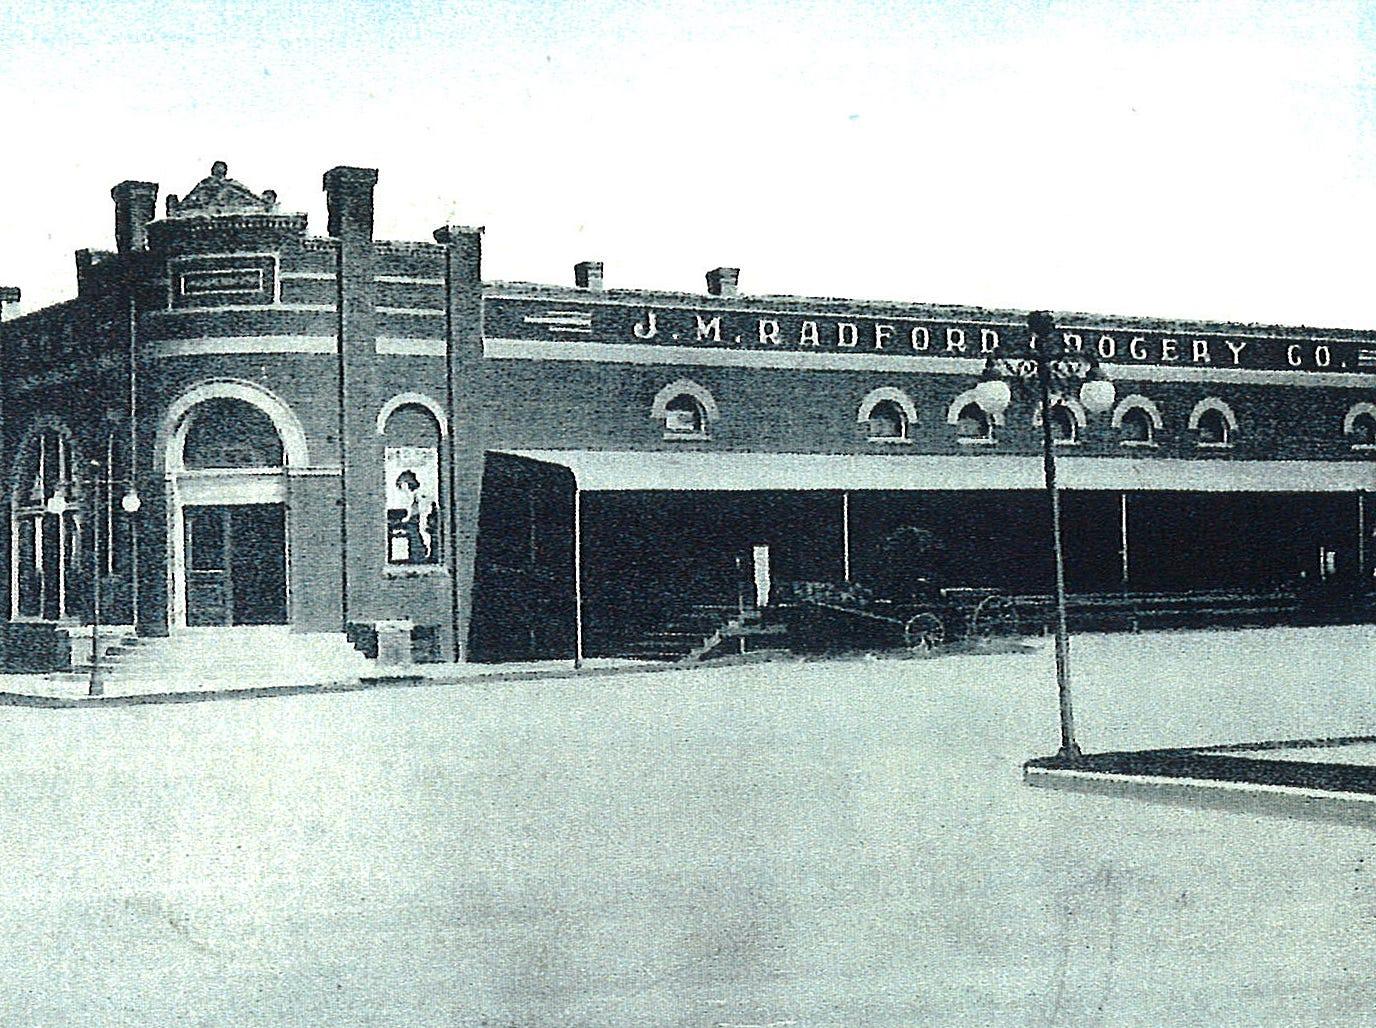 The J.M. Radford Grocery Company, circa 1910.